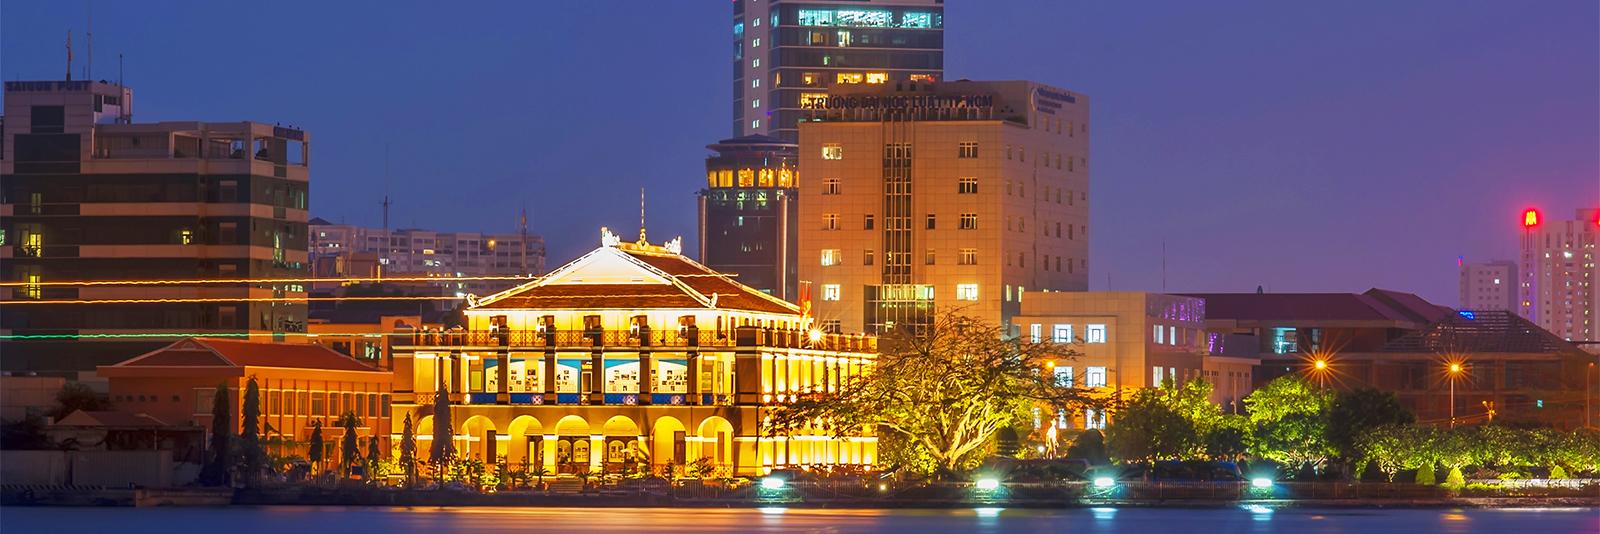 Northern - Hô Chi Minh Ville